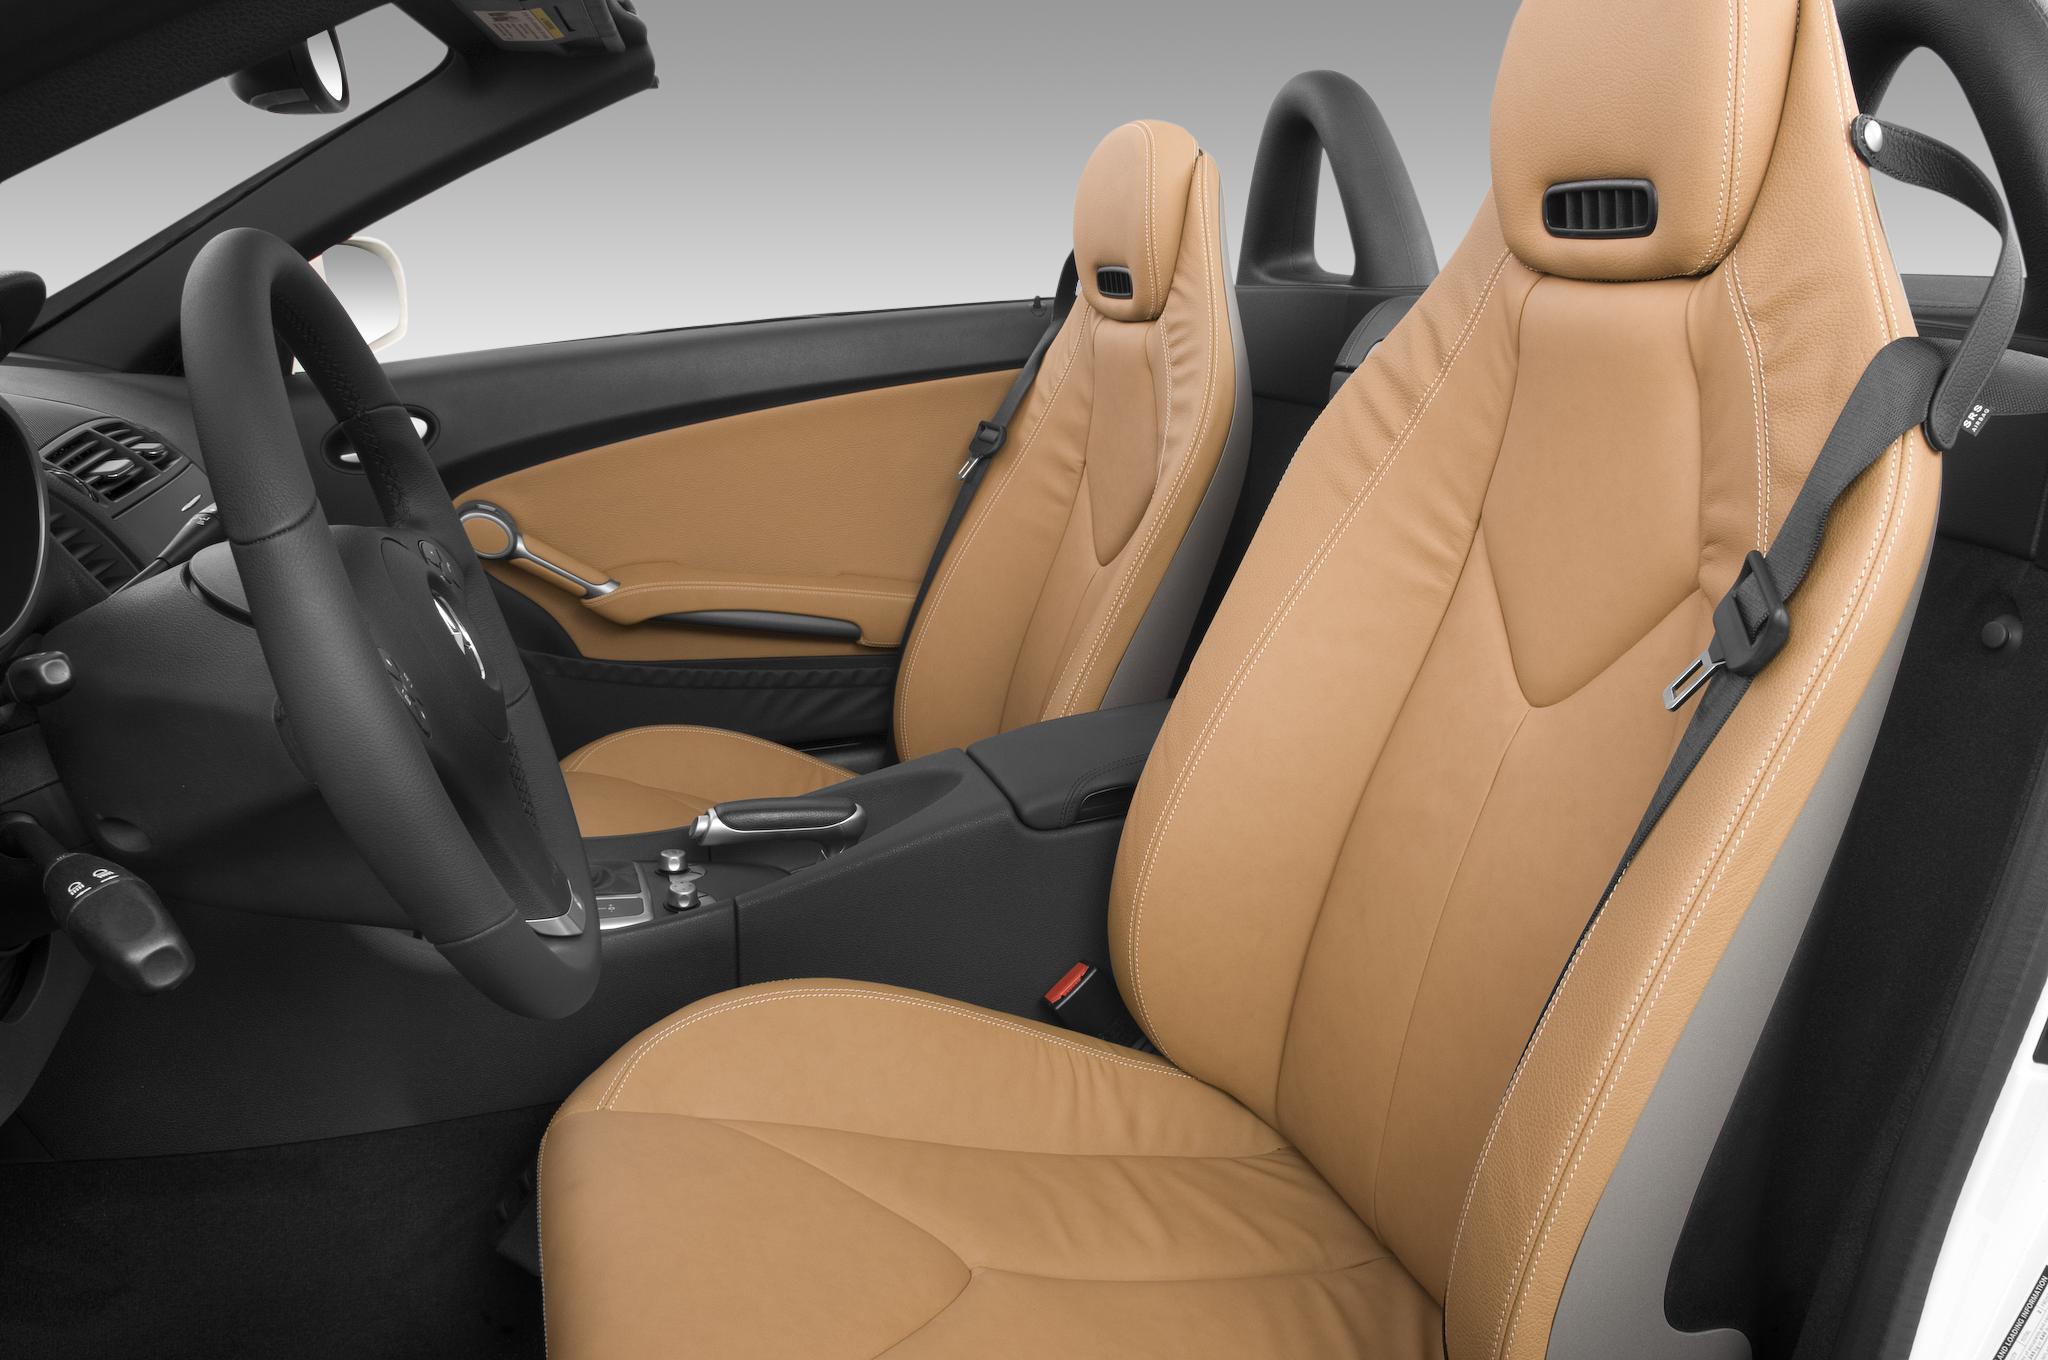 Bmw z4 sdrive35is vs mercedes benz slk350 comparison for Mercedes benz car seat covers sale